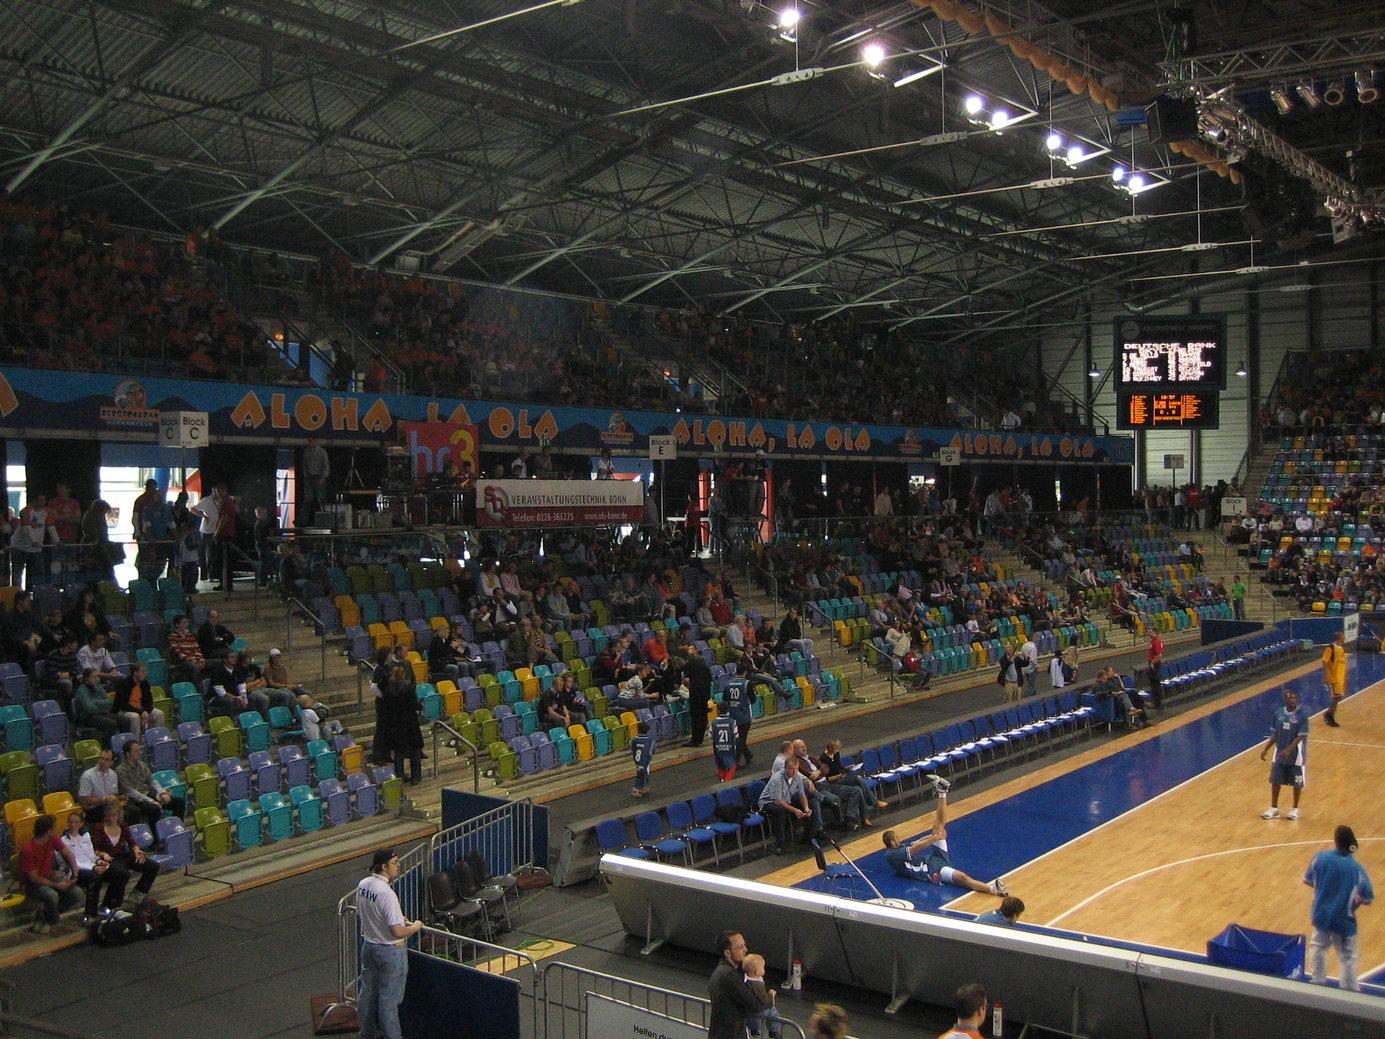 Soccerhalle Frankfurt